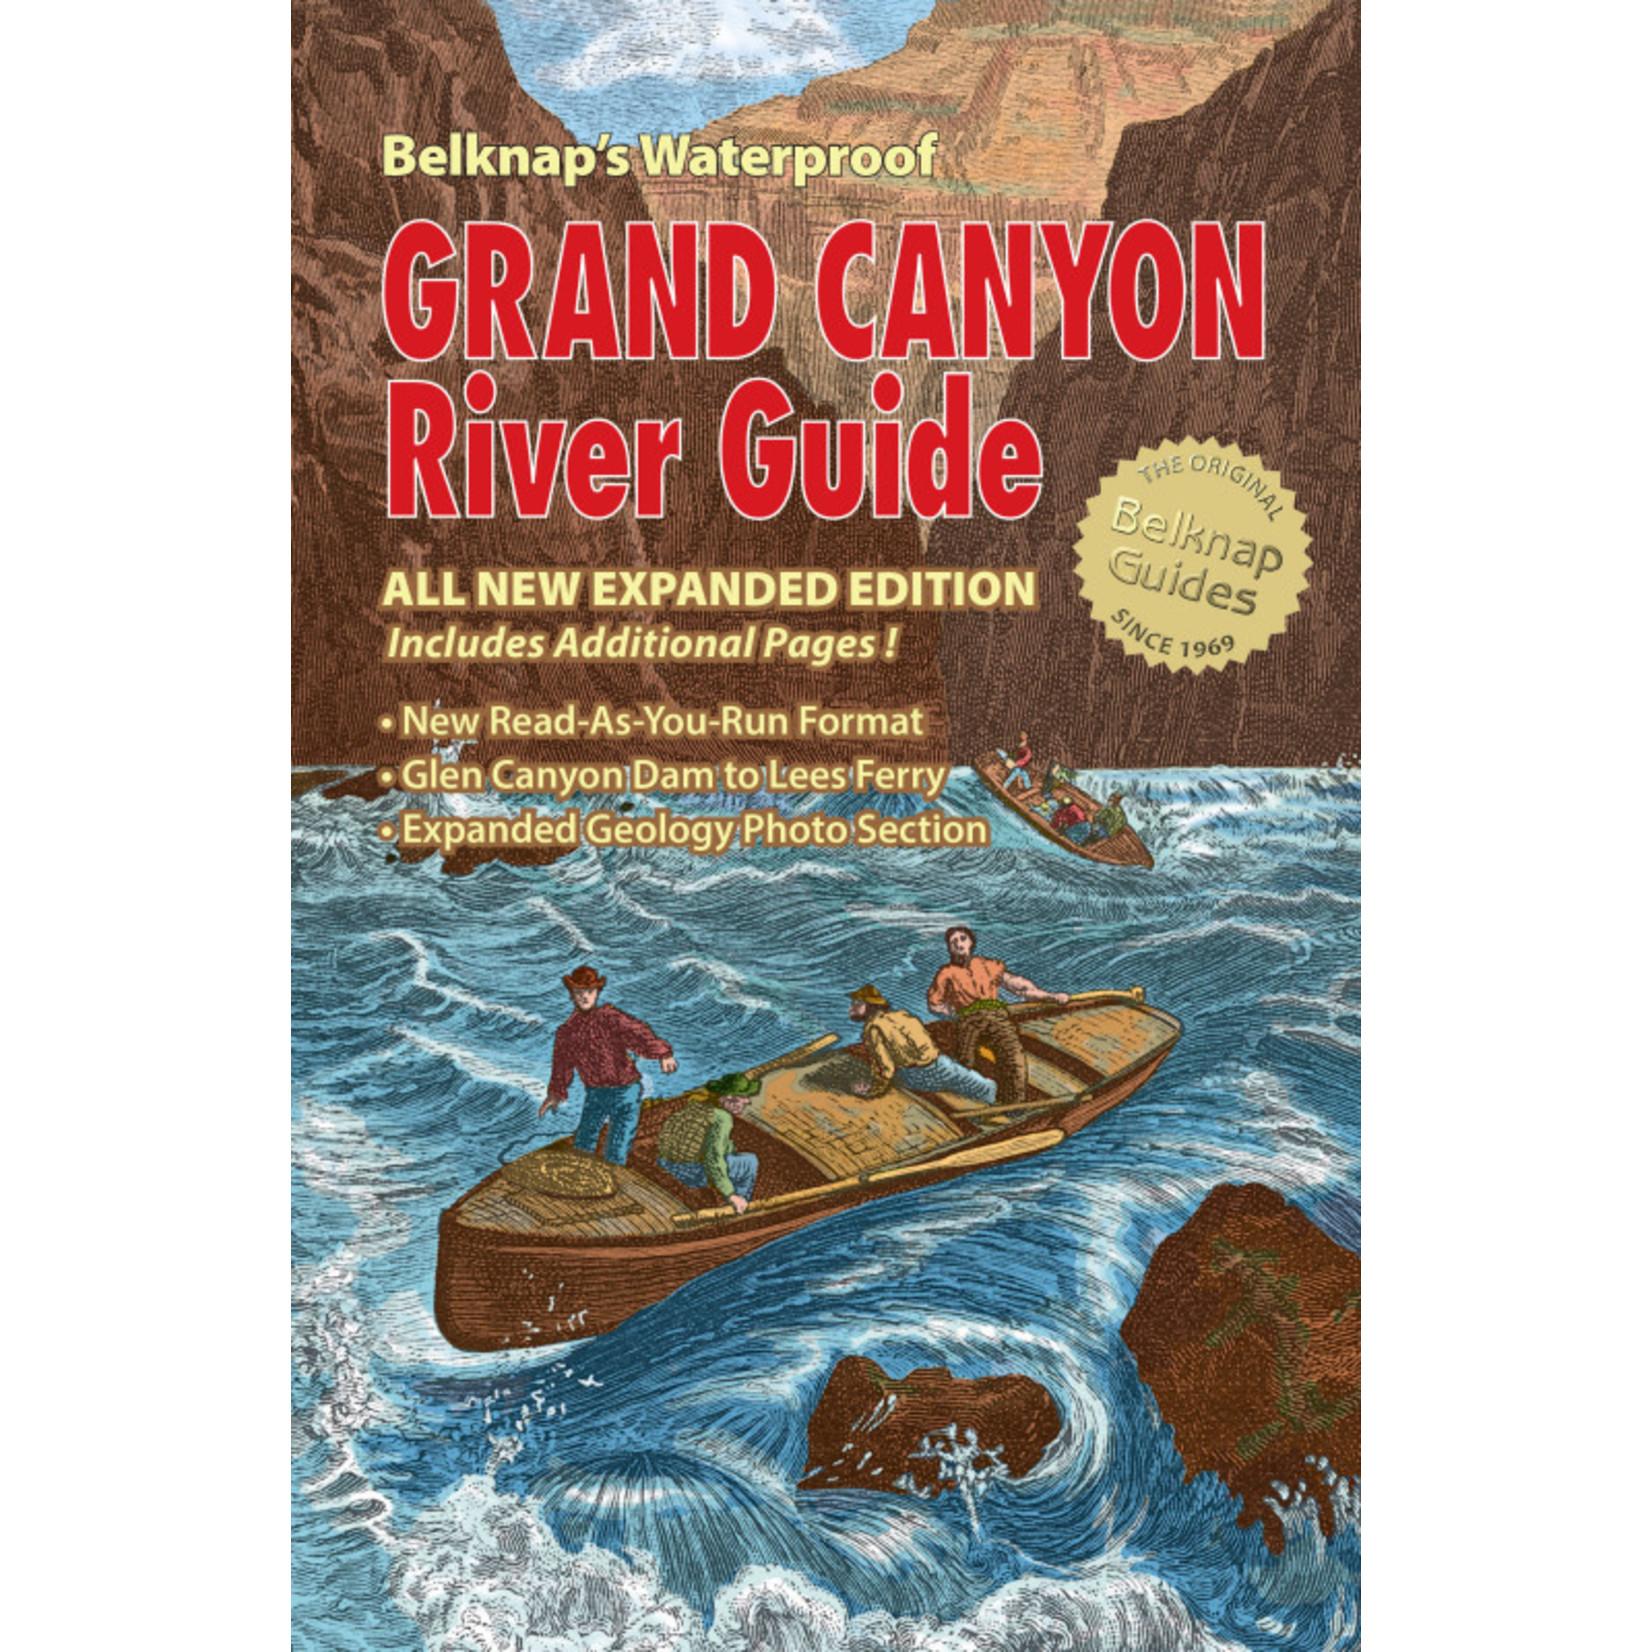 2017 Belknap's Waterproof Grand Canyon River Guide